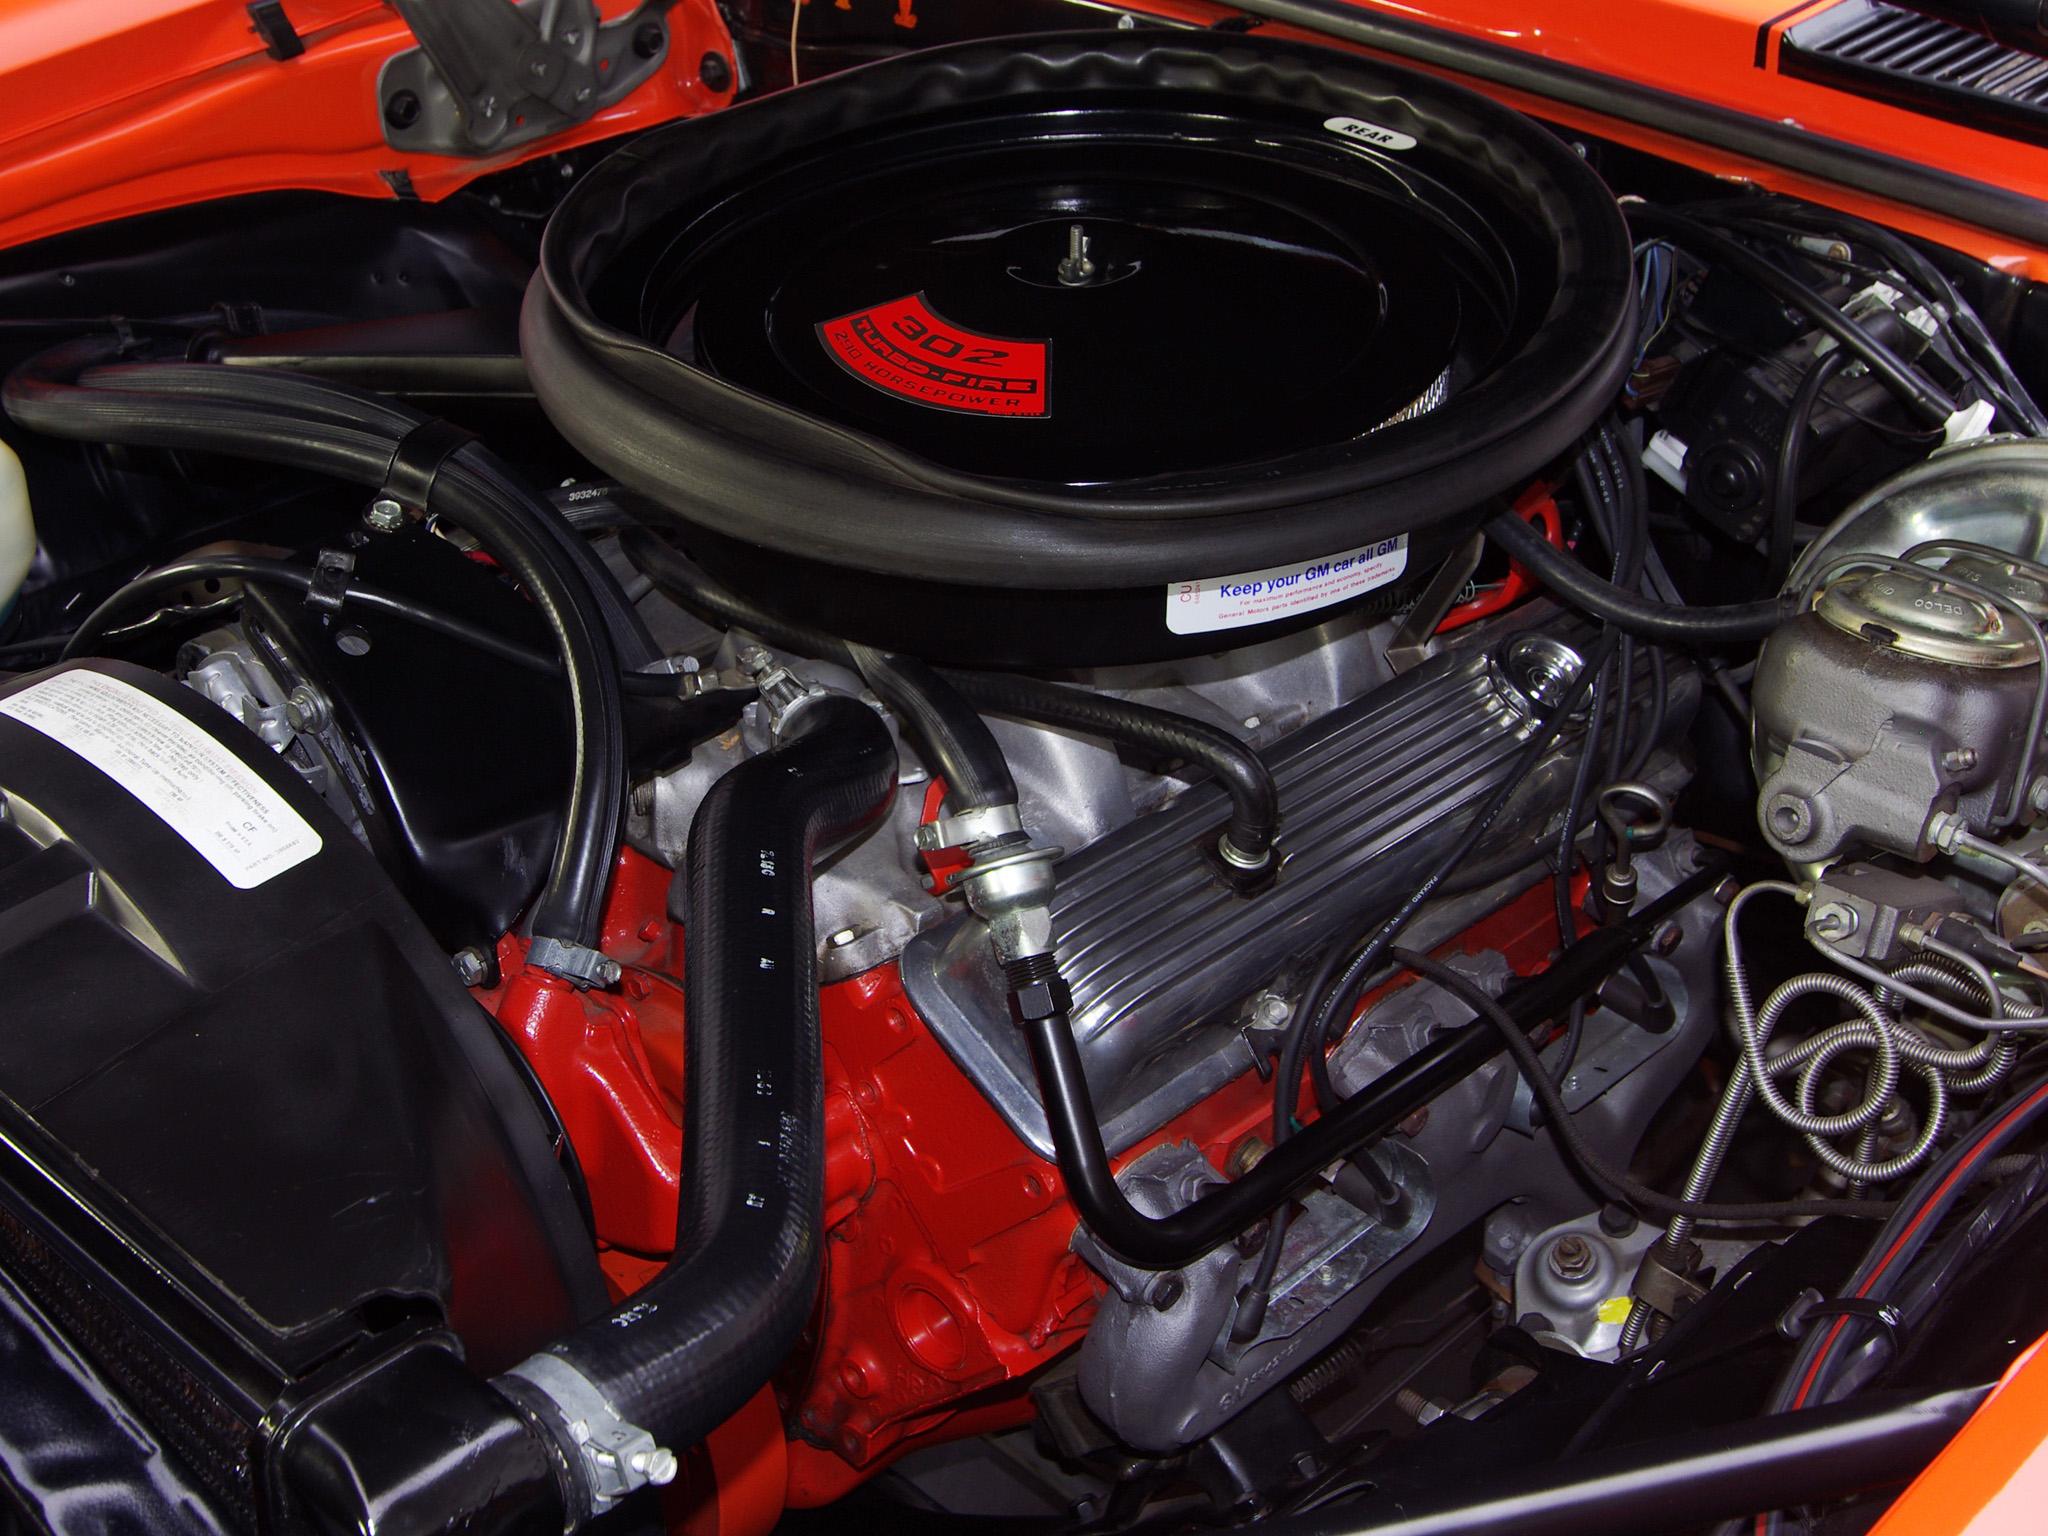 camaro engine chevrolet - photo #19